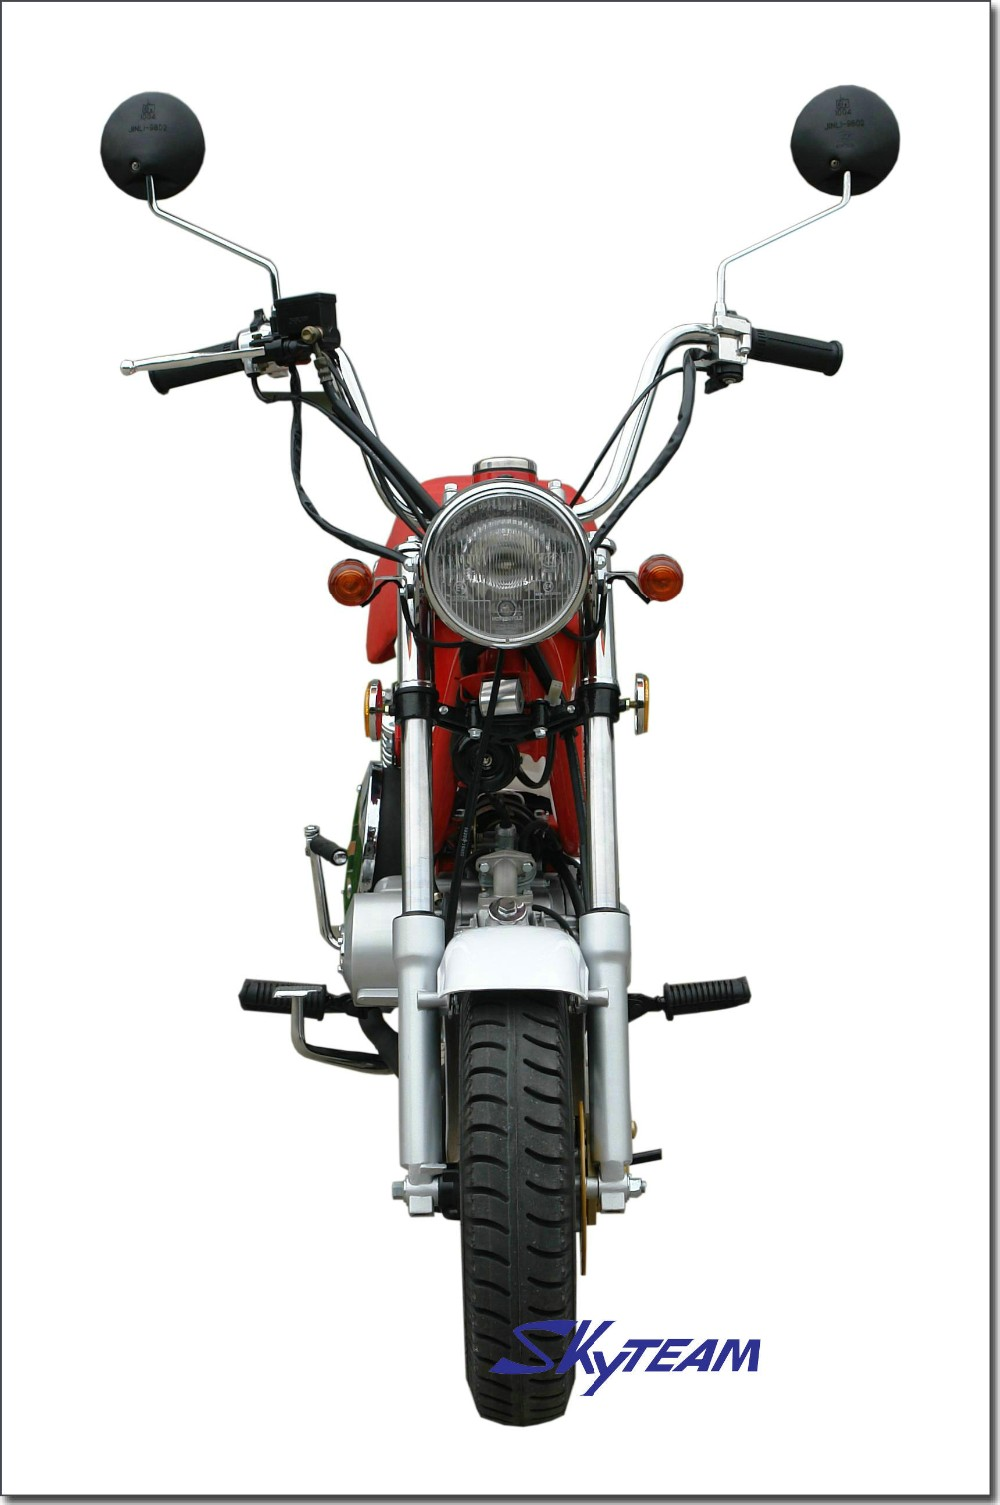 Skyteam 4 Stroke Bubbly 50cc &125cc Motorcycle Chappy(eec